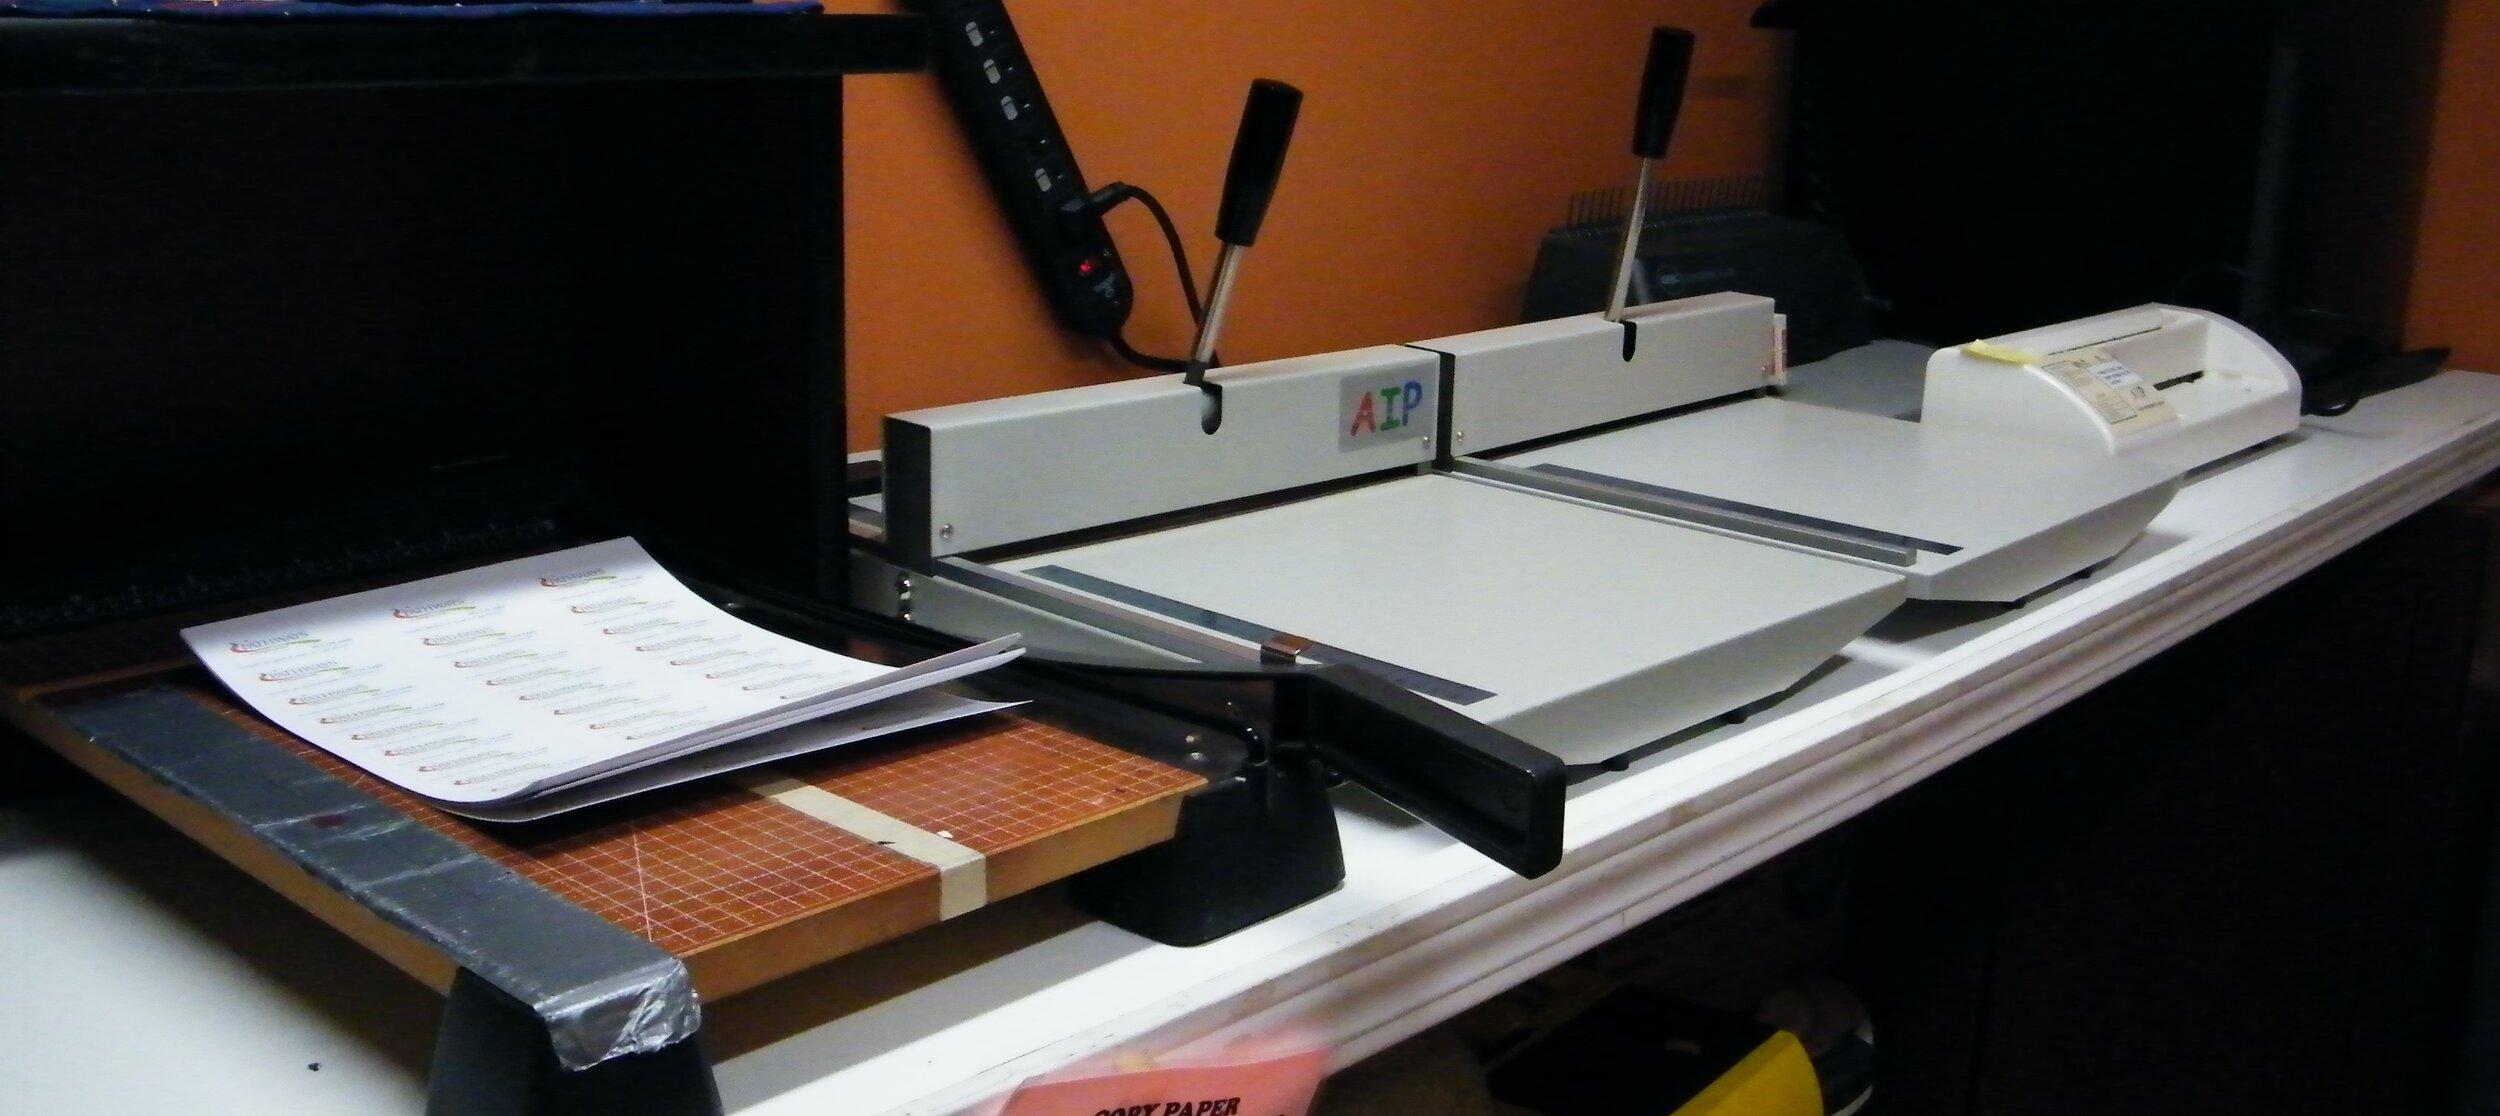 print shop equip.JPG